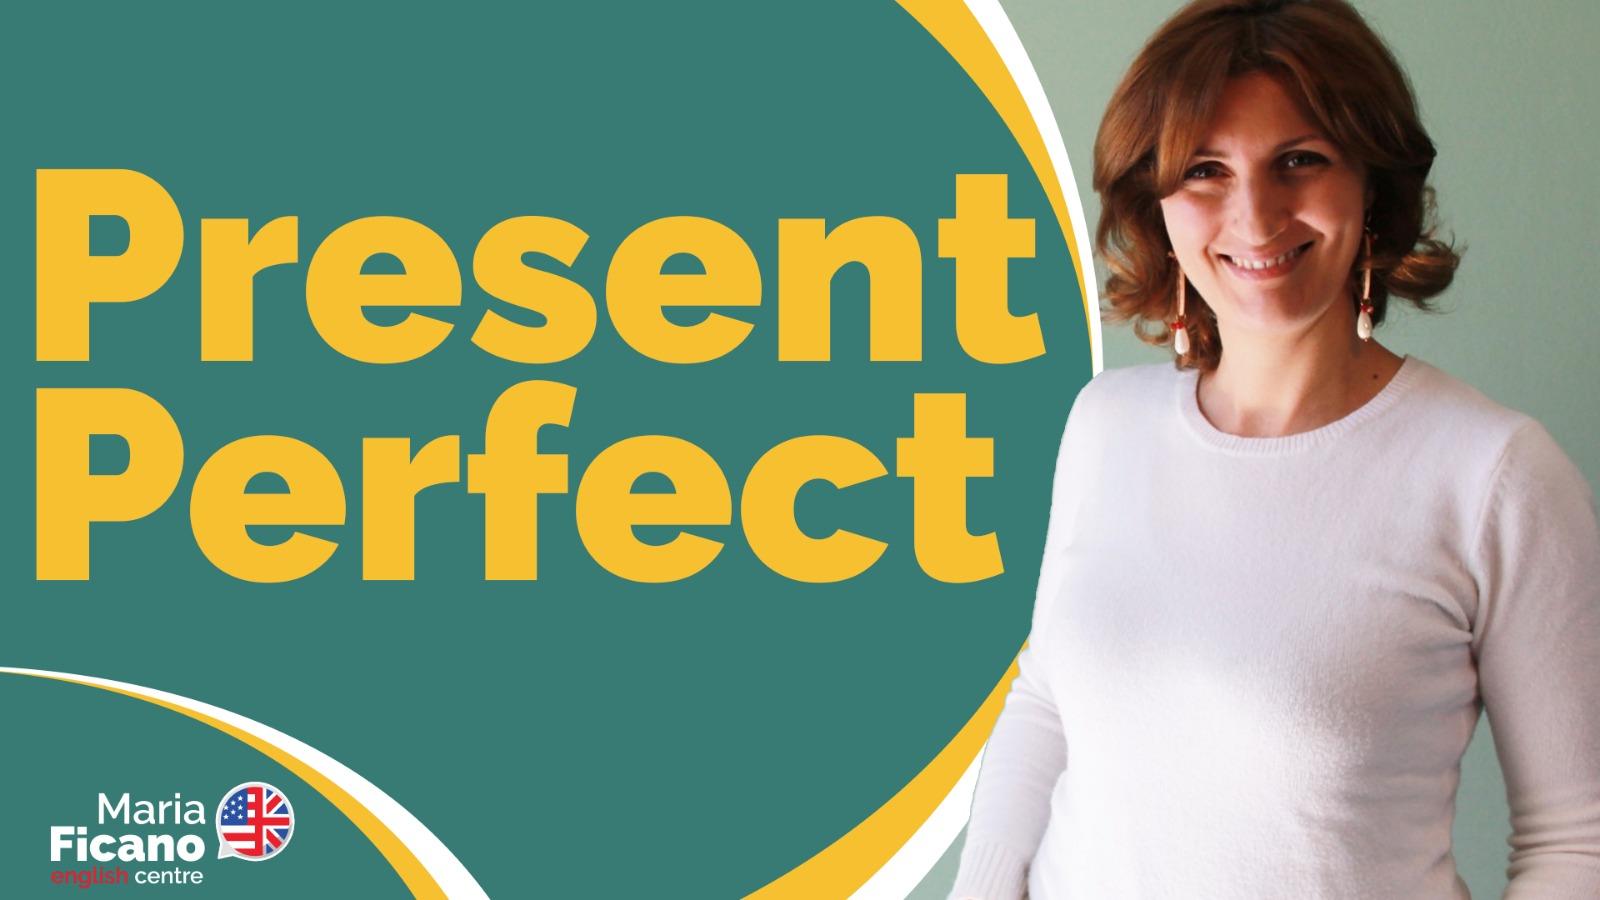 inglese, present perfect, passato, grammatica